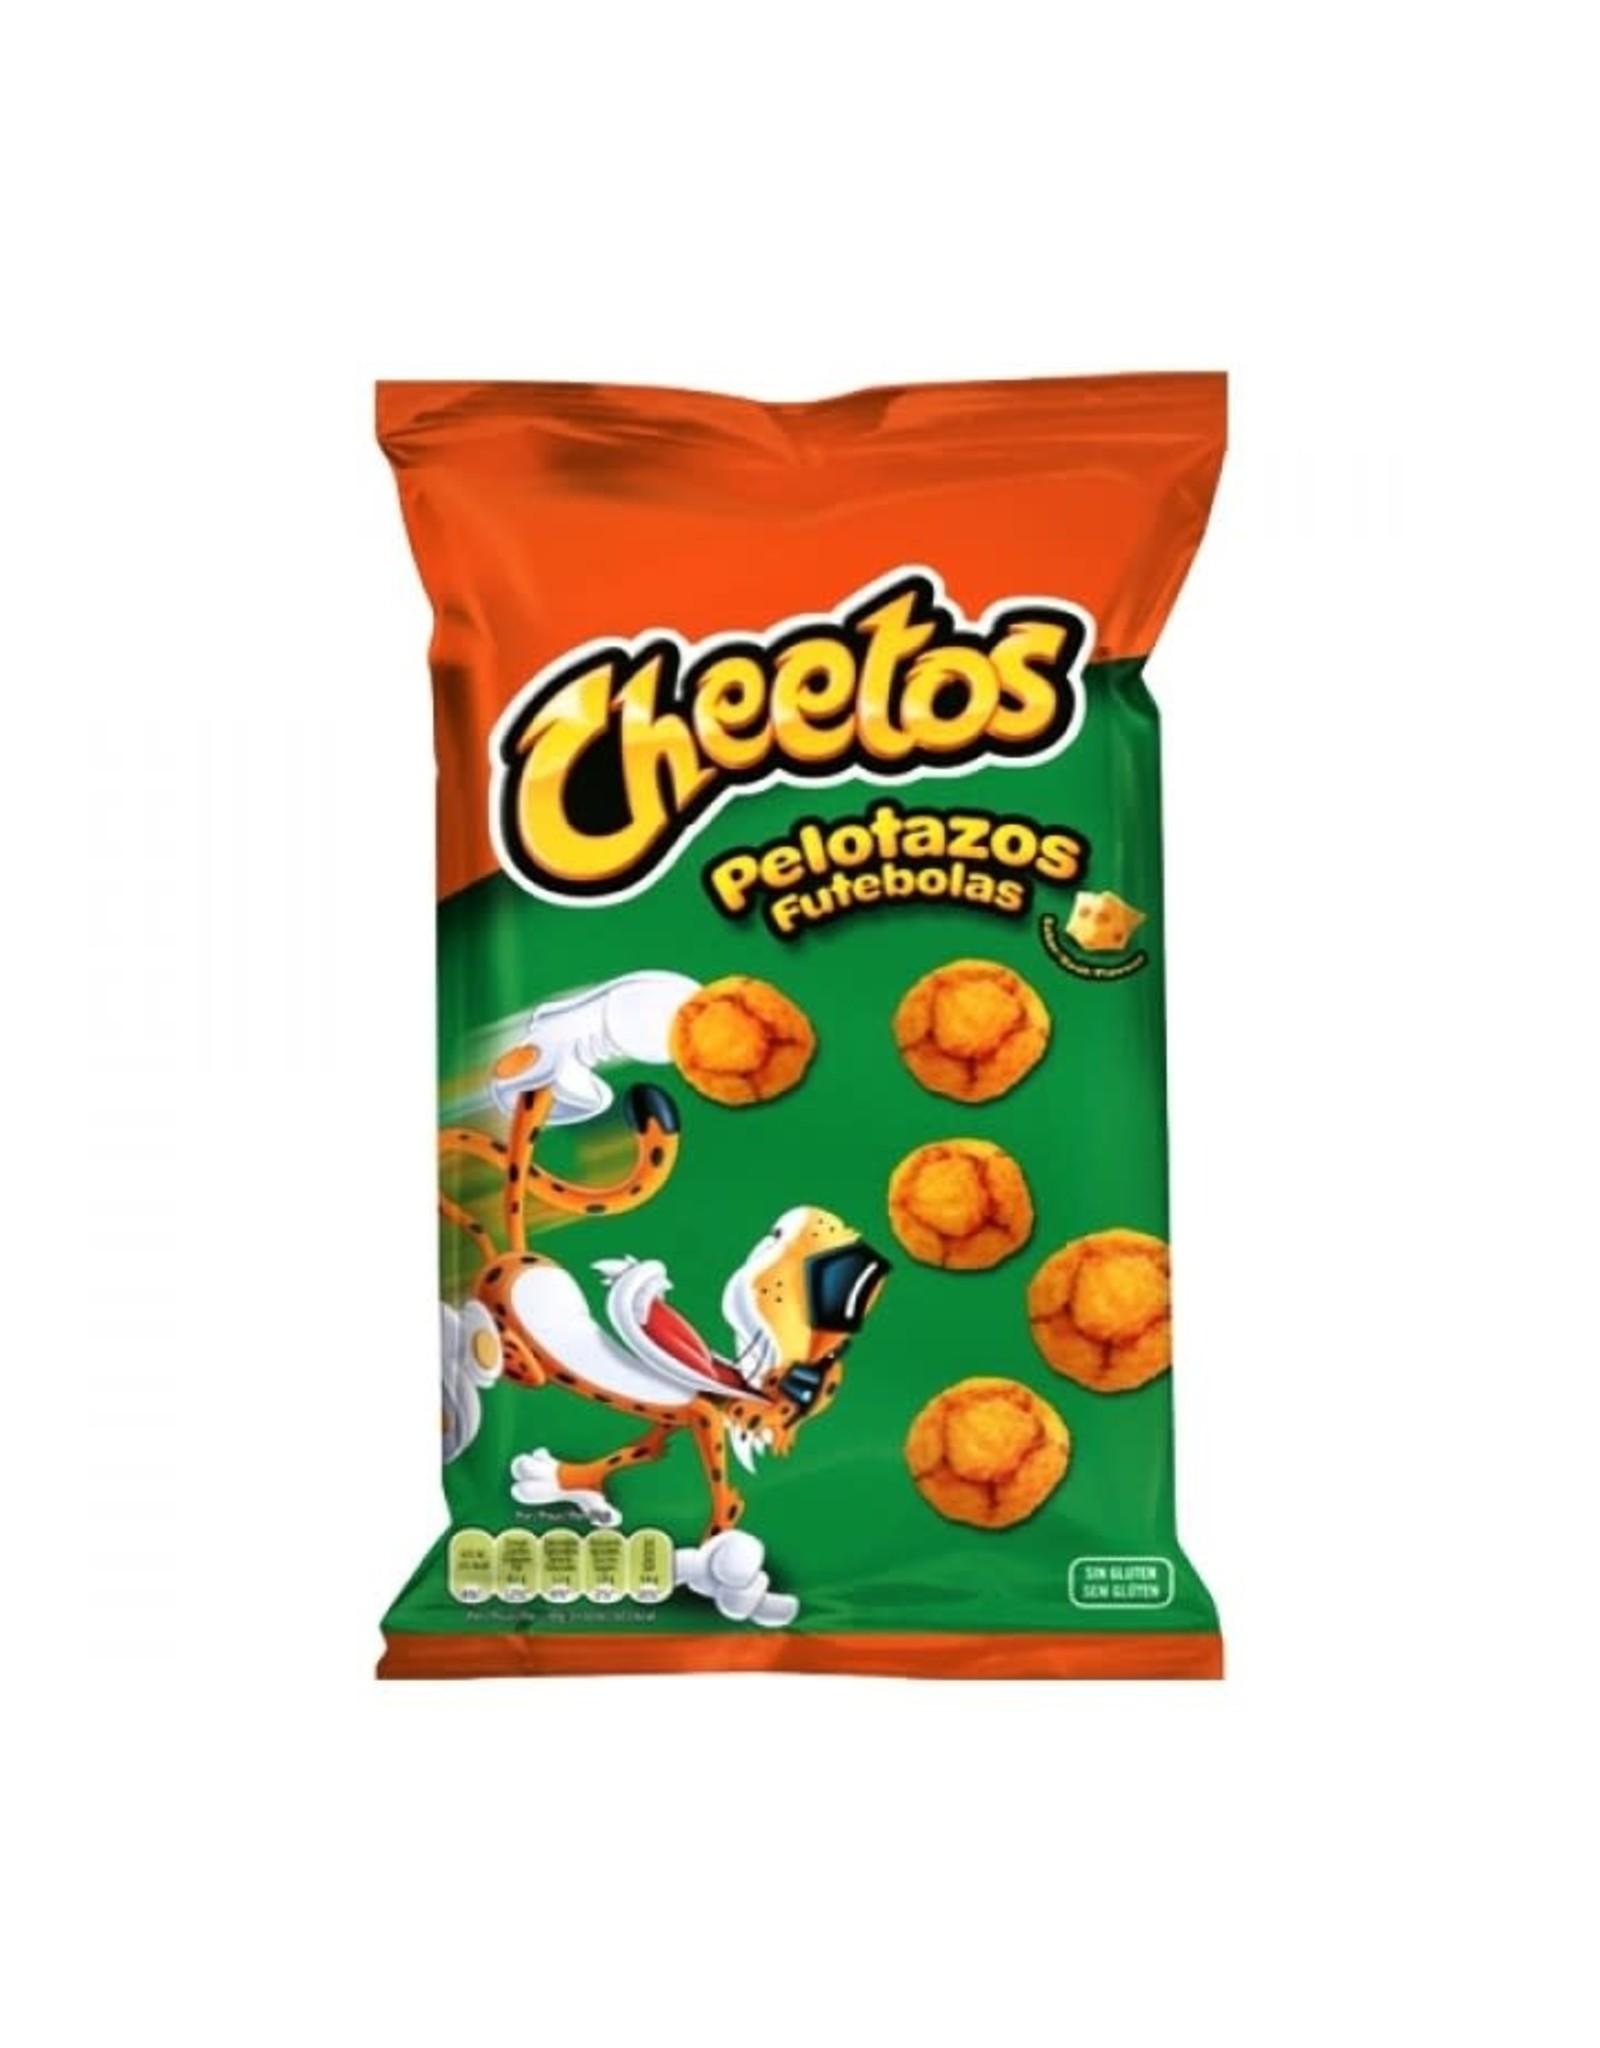 Cheetos Pelotazos Futebolas - 130g